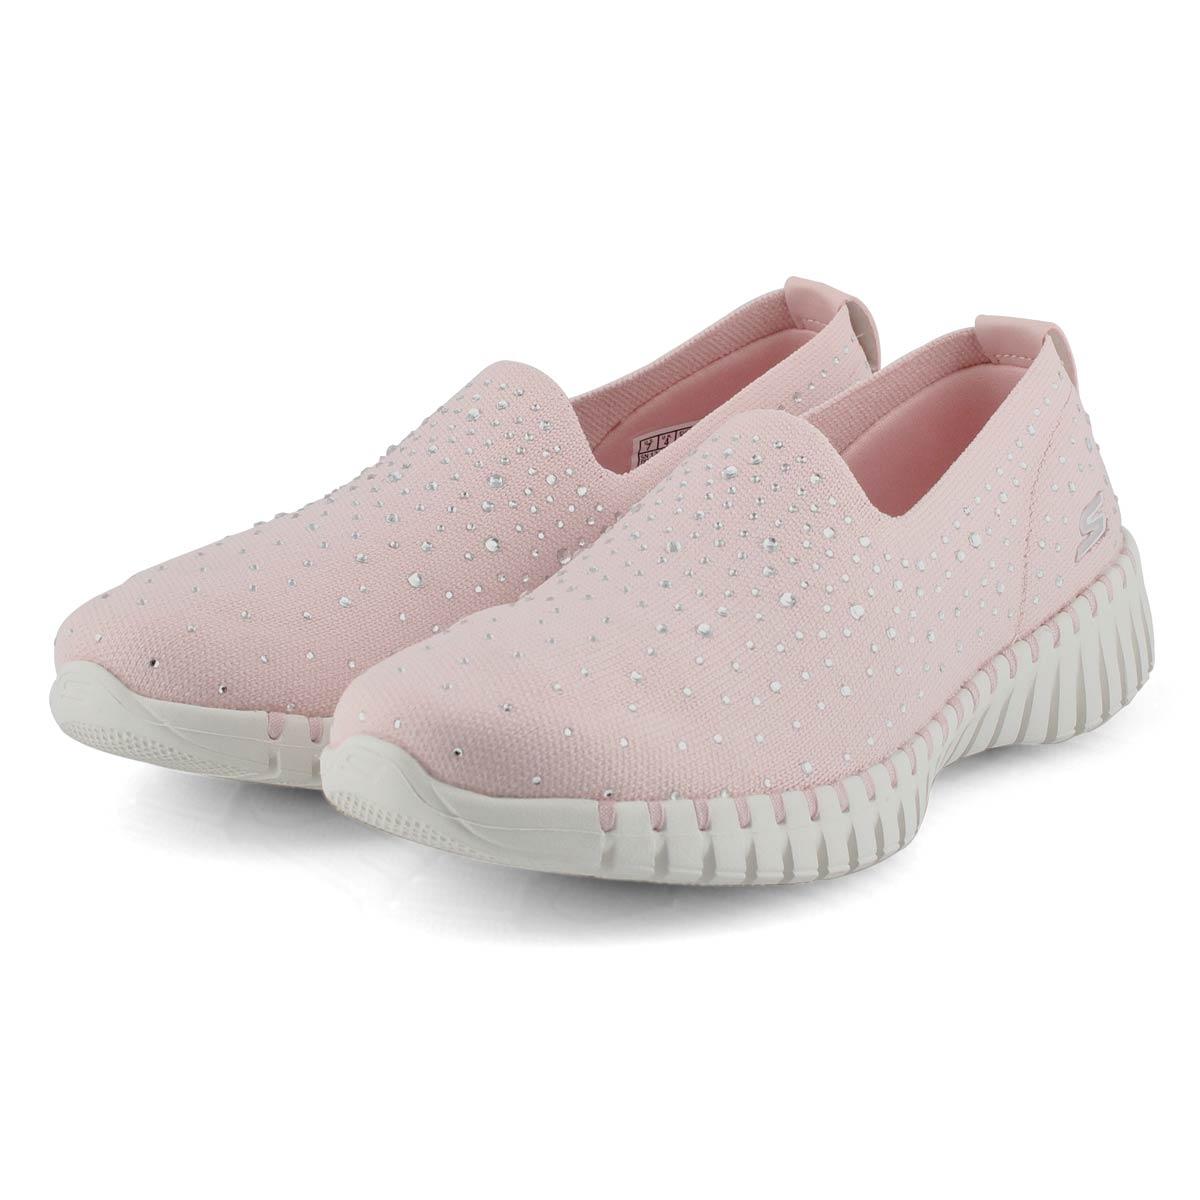 Lds GOwalk Smart lt pnk slip on shoe